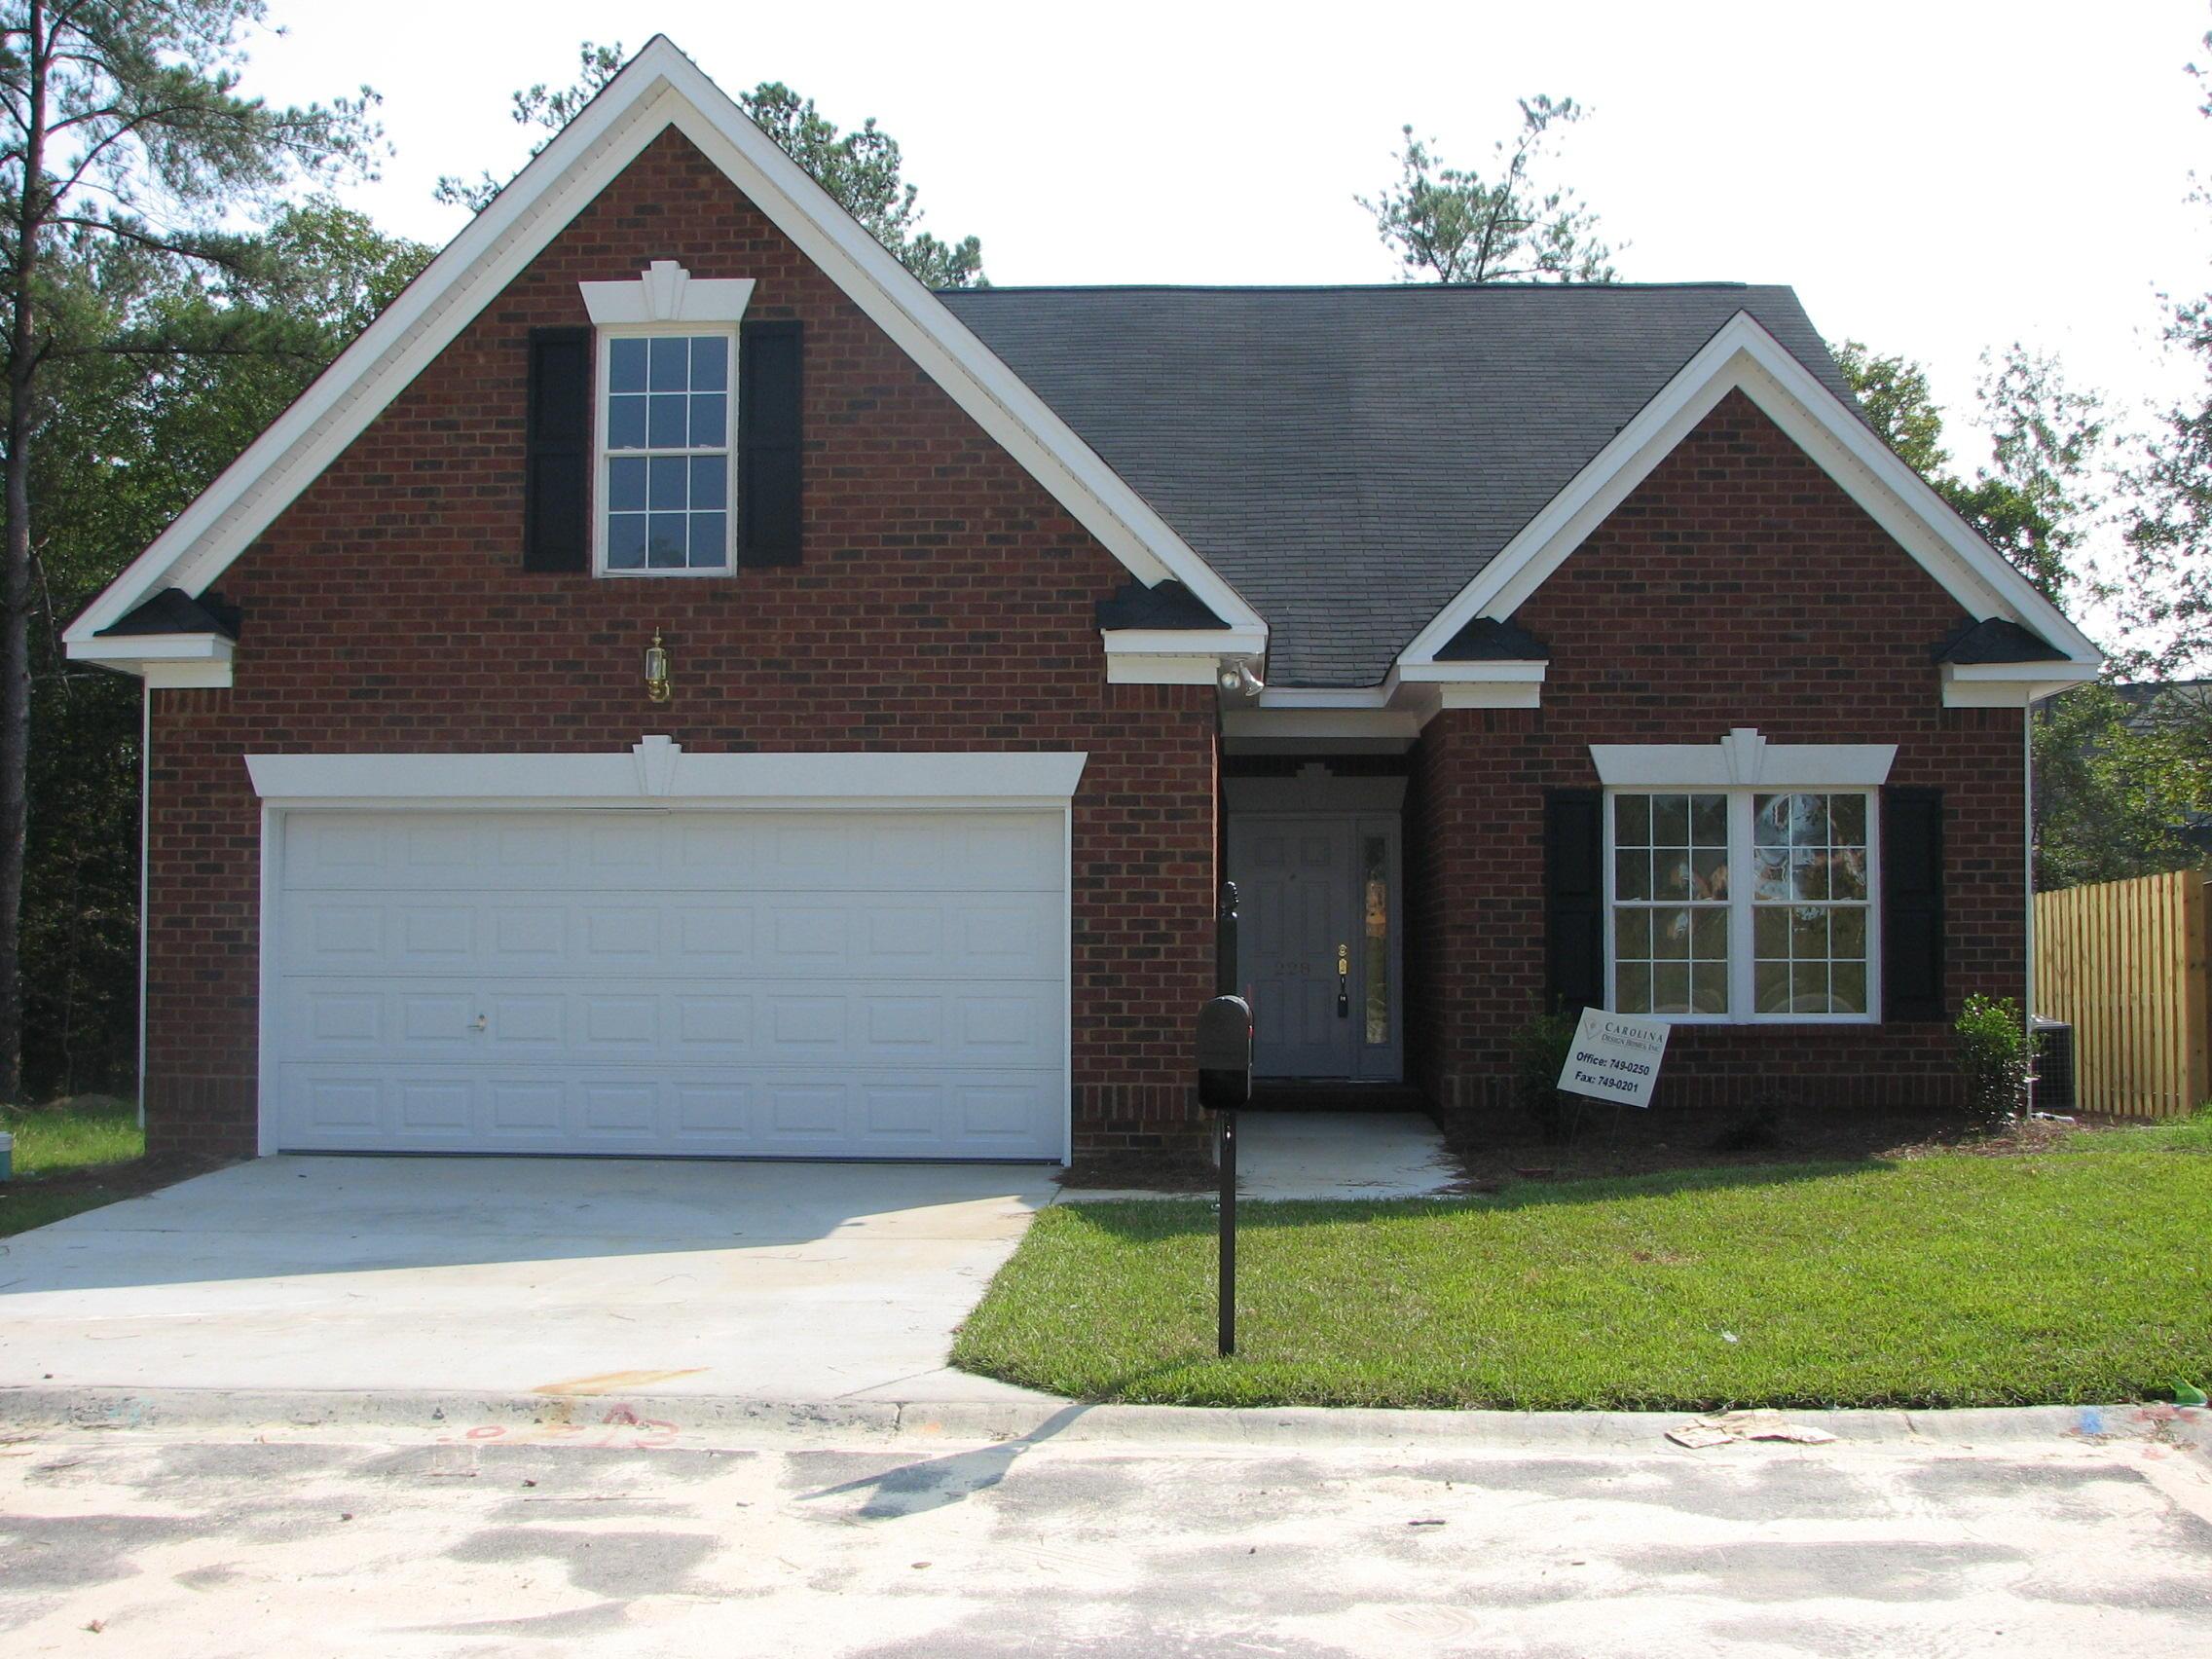 Orchard Hill Homes For Sale - 125 Pemberton, Summerville, SC - 0